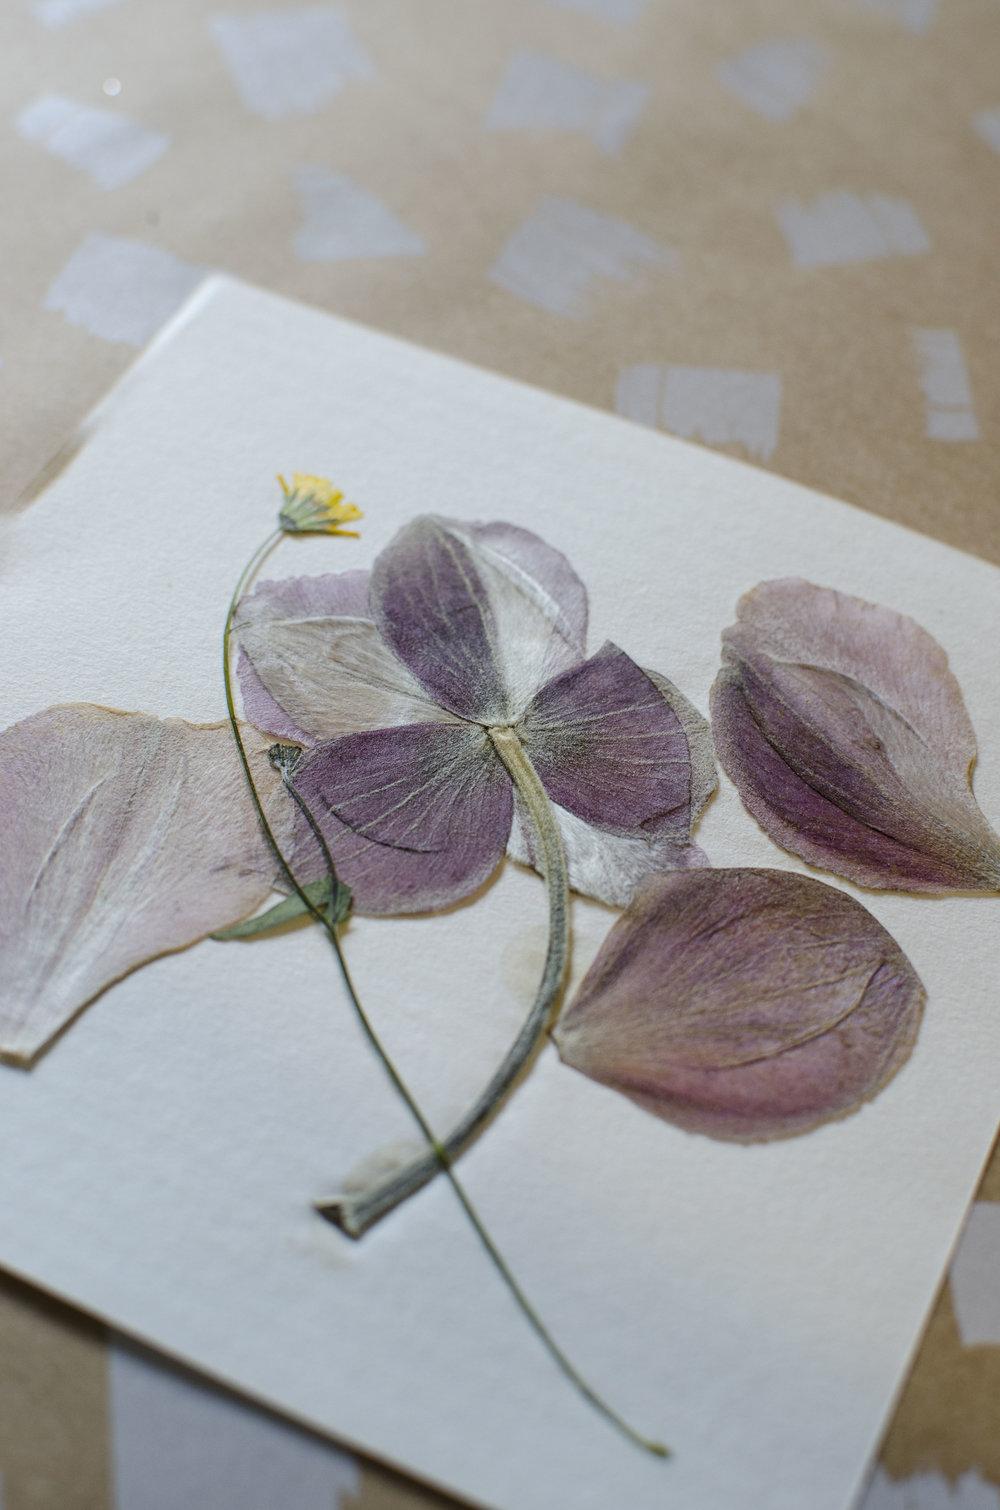 Diy flower press cards joyride diy flower press cards mightylinksfo